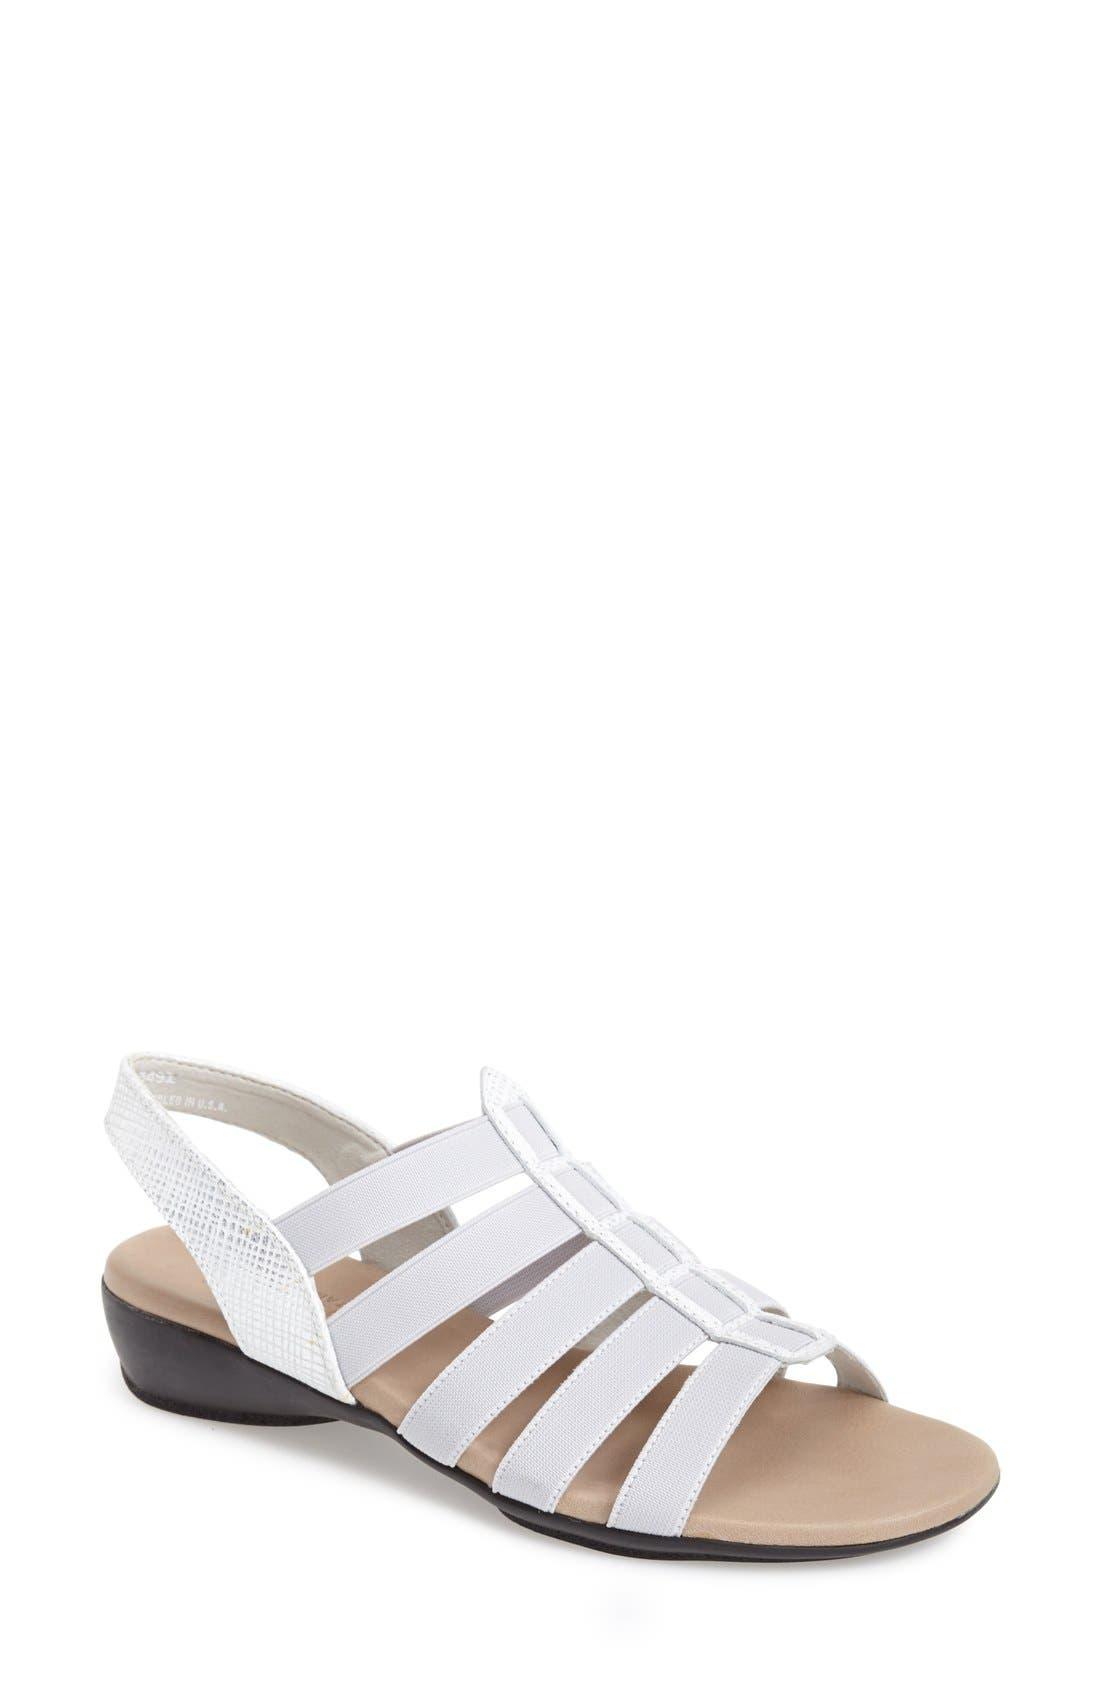 Main Image - Munro 'Darian' Slip-On Sandal